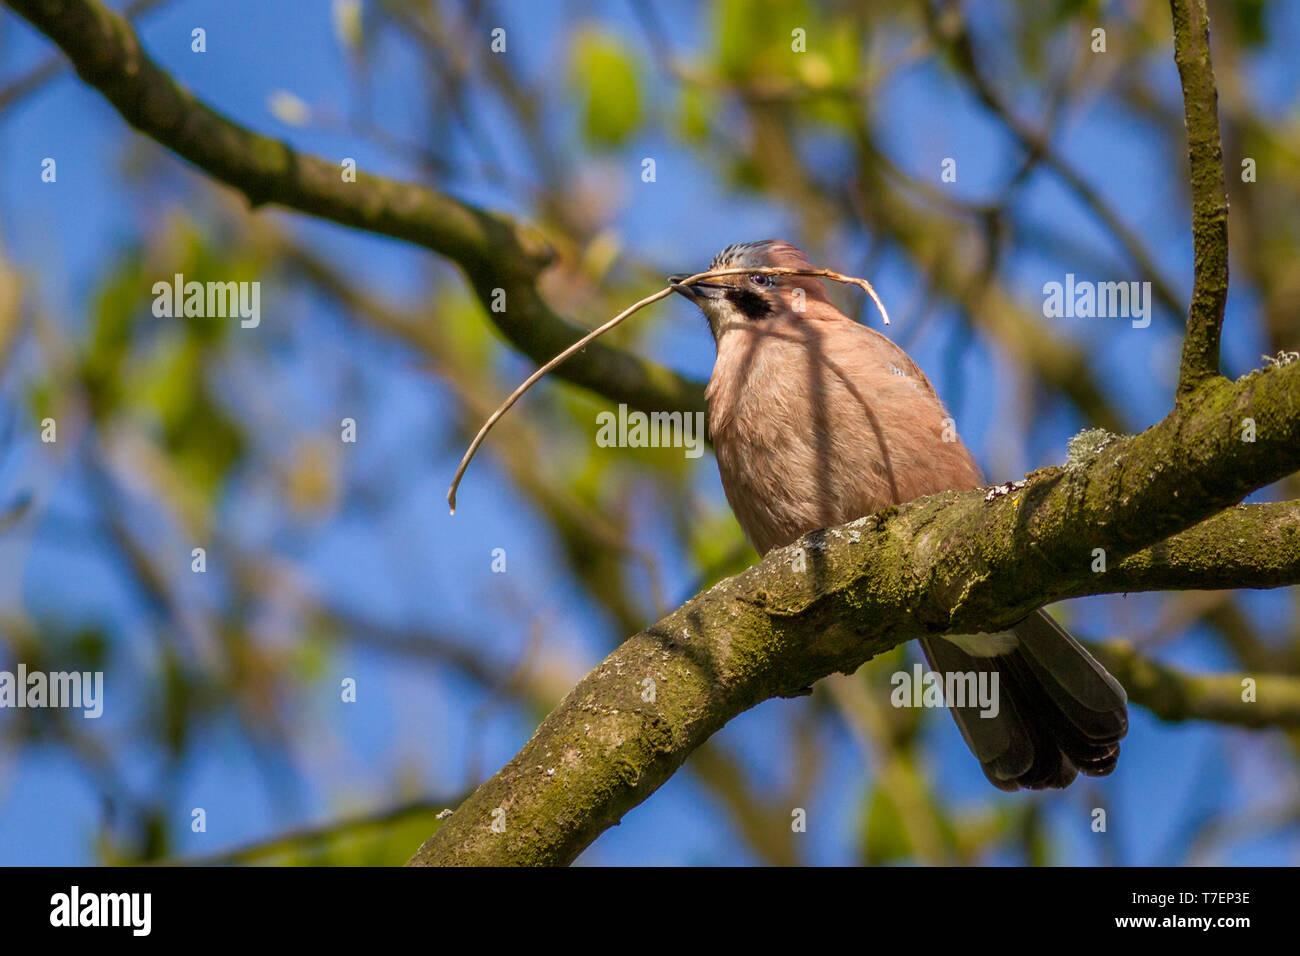 Jay, Garrulus glandarius, collecting nesting material in its beak, perched in a tree UK - Stock Image